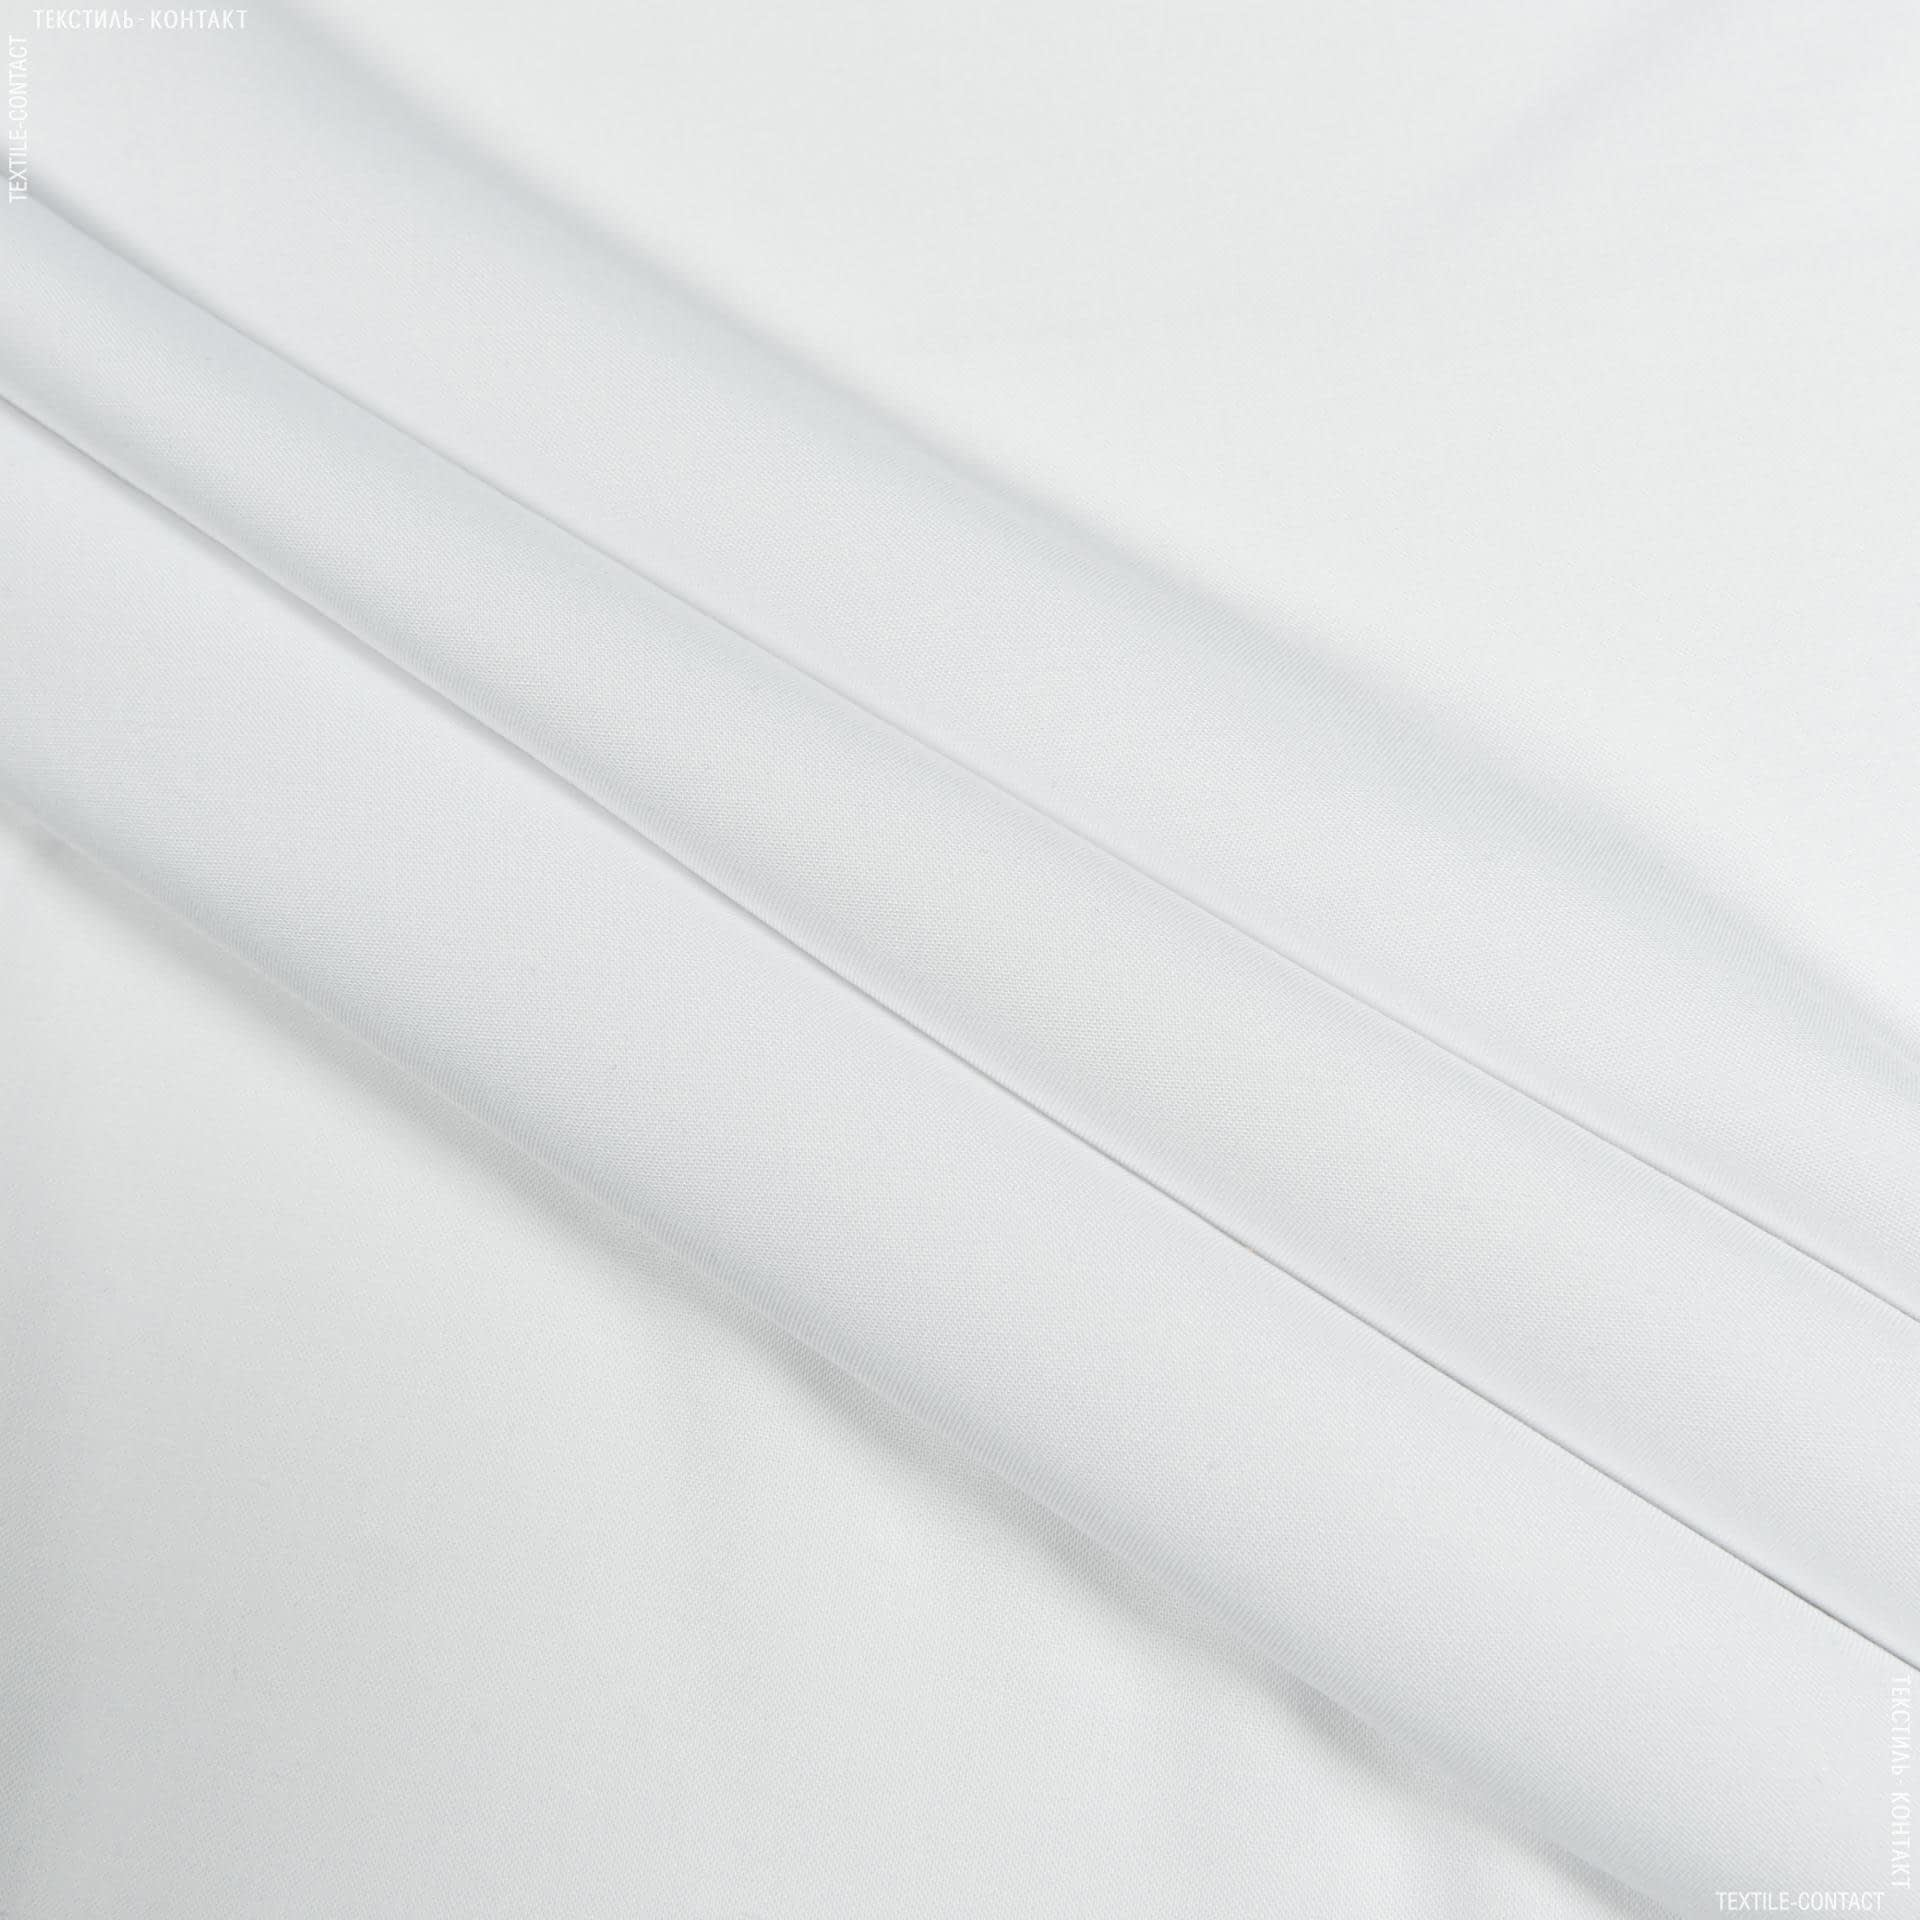 Тканини для дитячого одягу - Штапель фалма білий